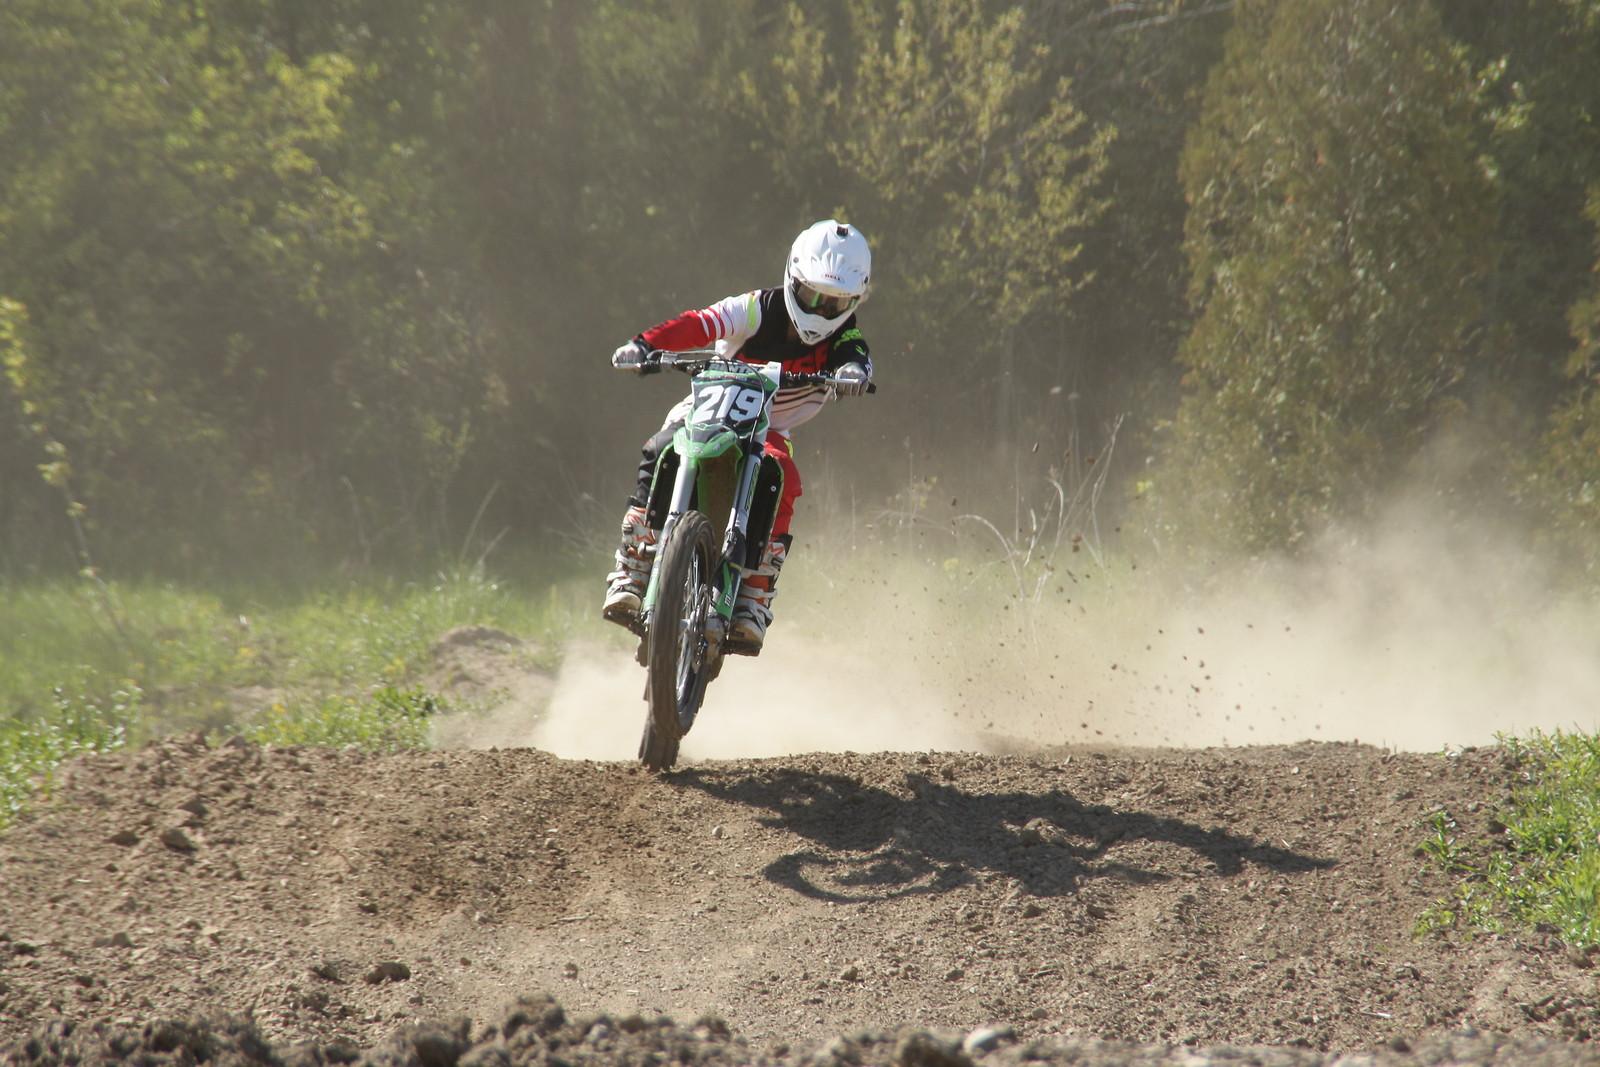 IMG 9636 - Sick_Nwanson - Motocross Pictures - Vital MX